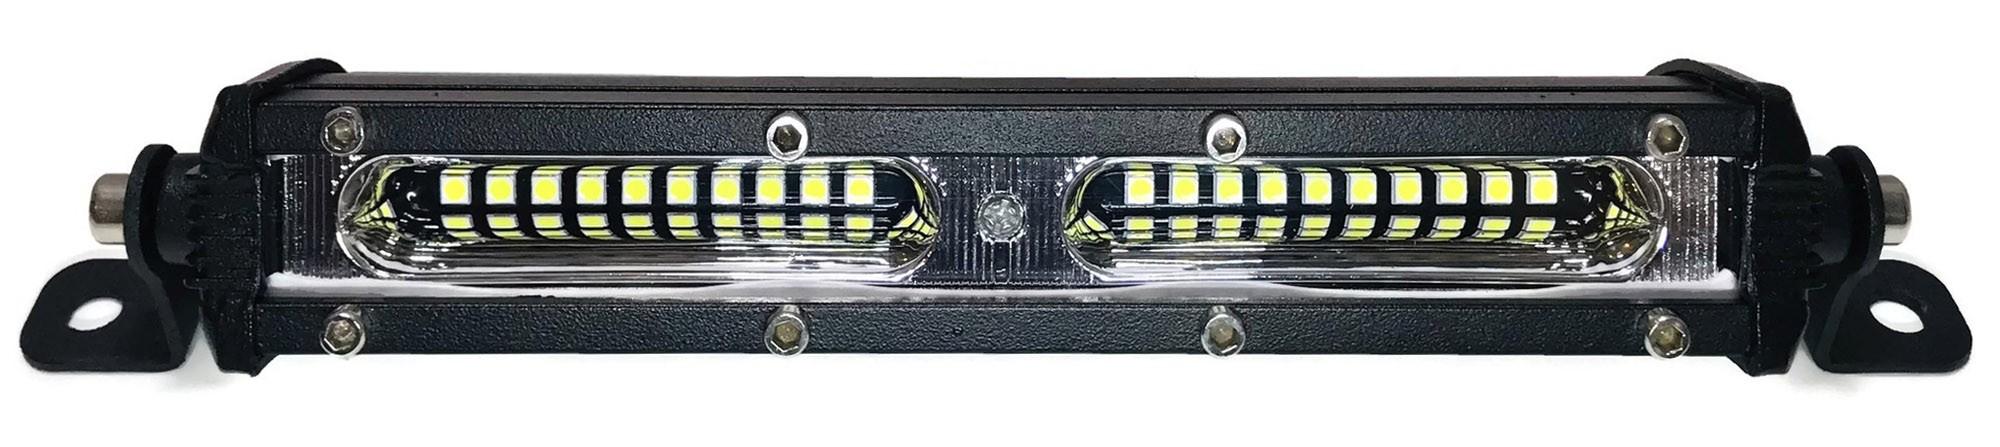 LIGHTBAR PANEL LED MINI LAMPA ROBOCZA SZEROKOKĄTNA